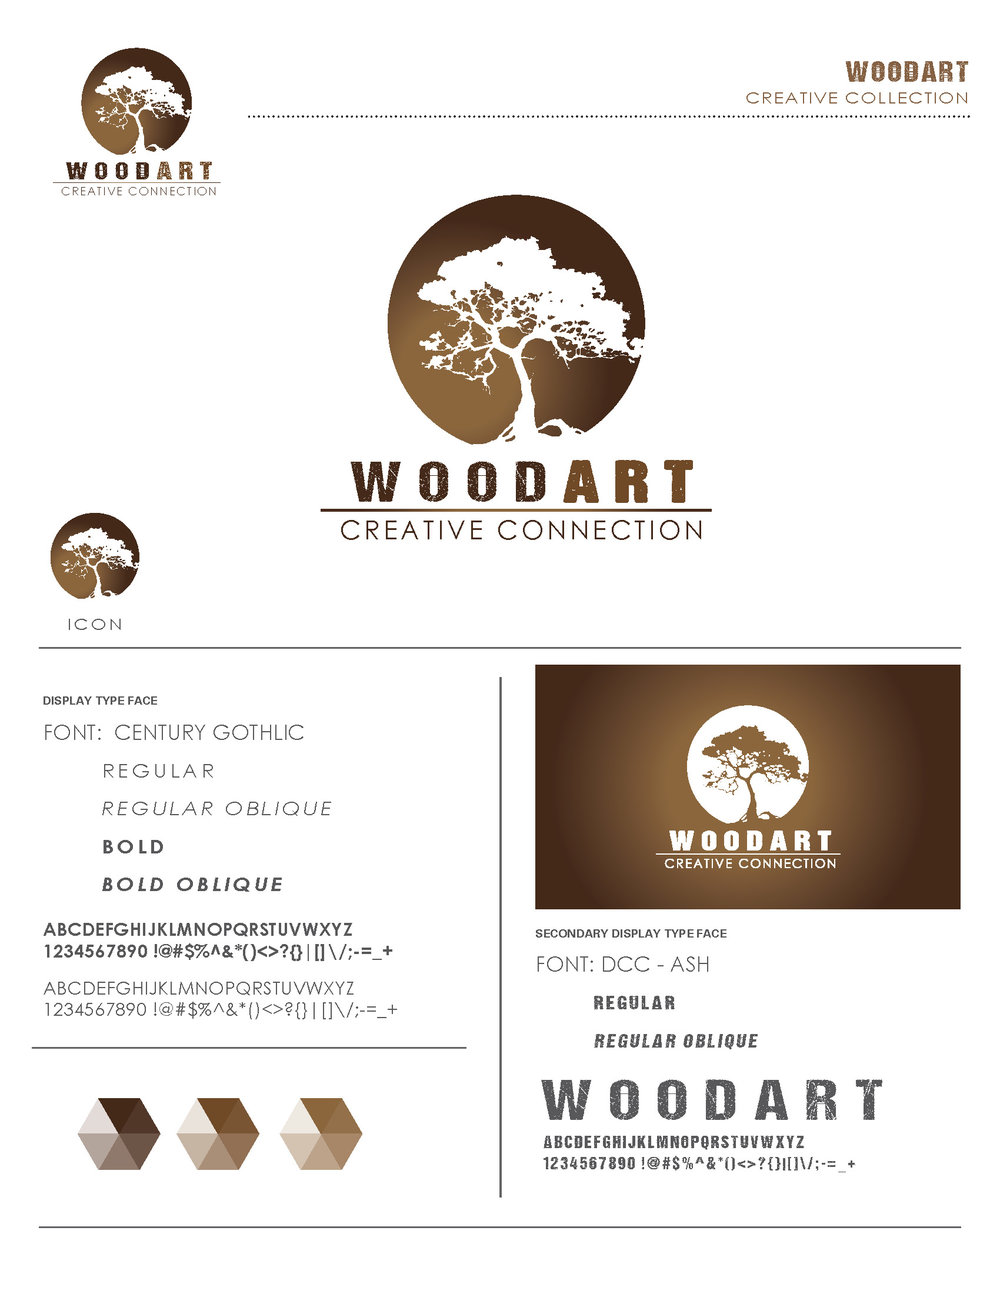 Wood Art_styleguide.jpg